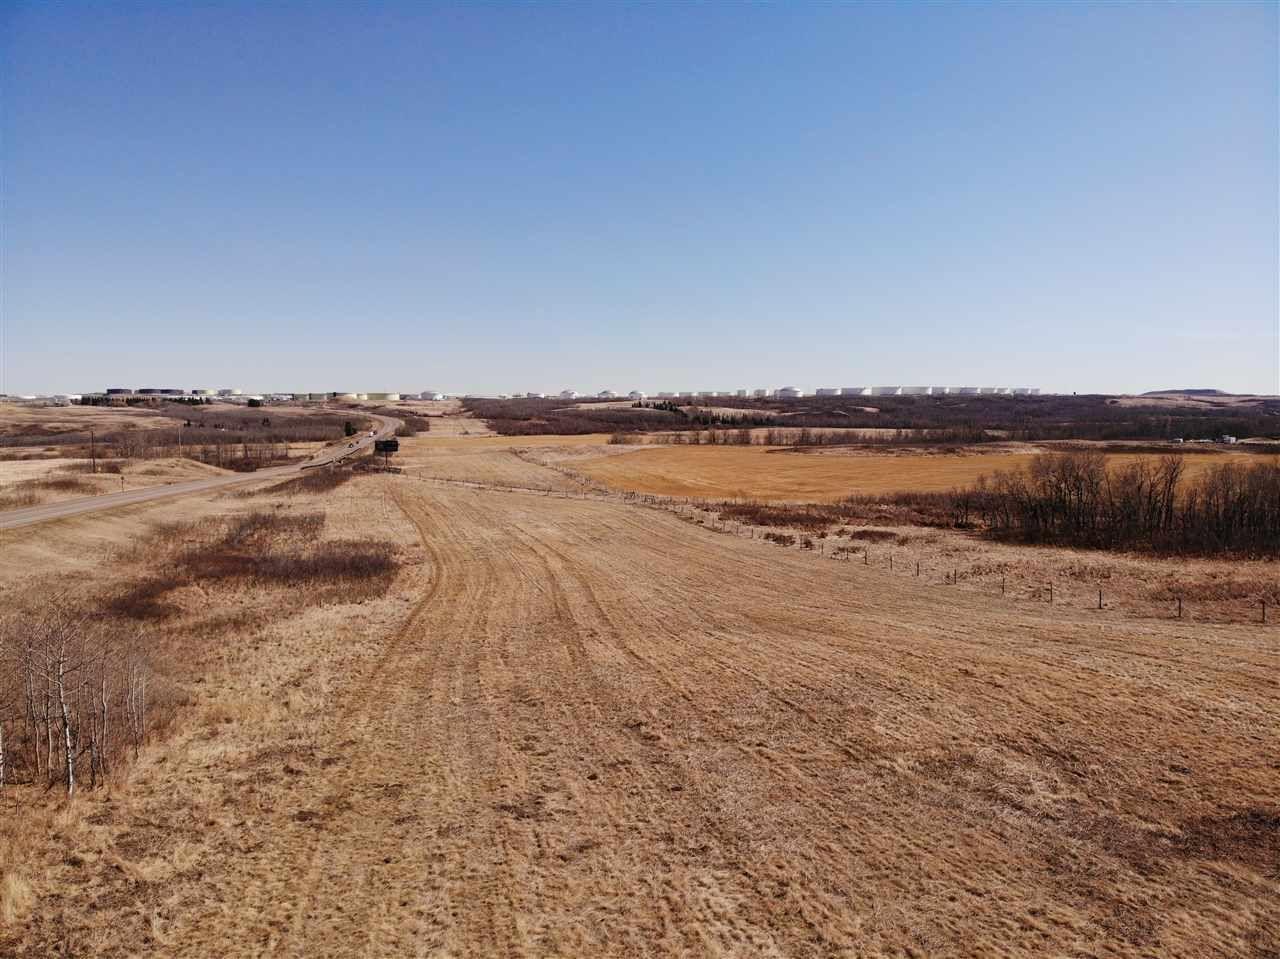 Main Photo: SE-36-42-10-W4 Bitzer Estates: Rural Flagstaff County Rural Land/Vacant Lot for sale : MLS®# E4237924